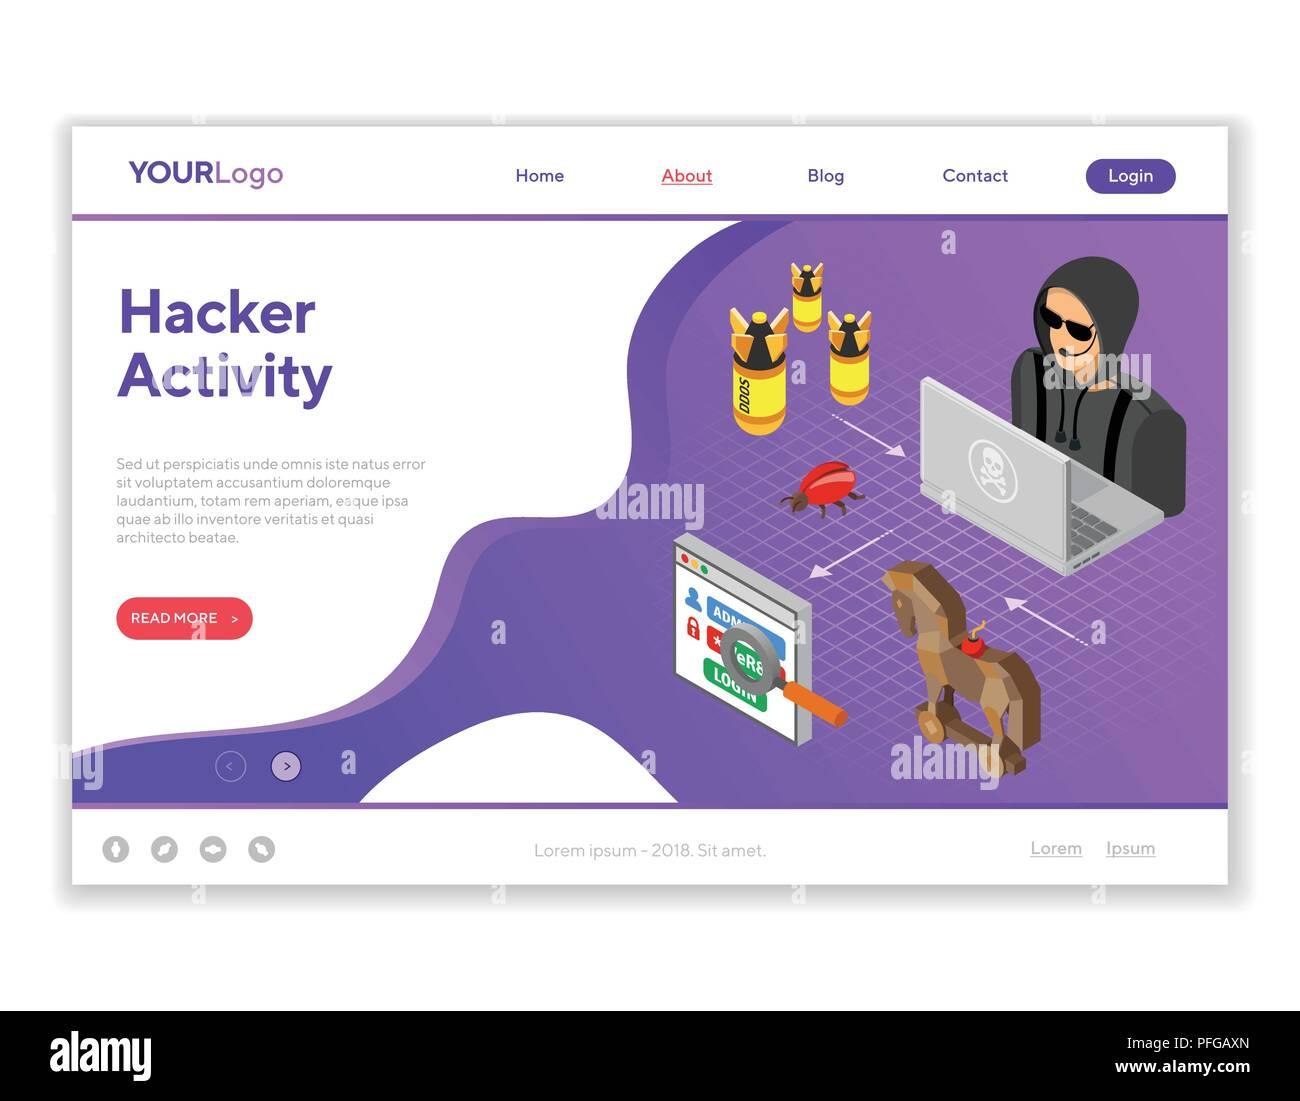 Hacker Activity Concept Isometric - Stock Image